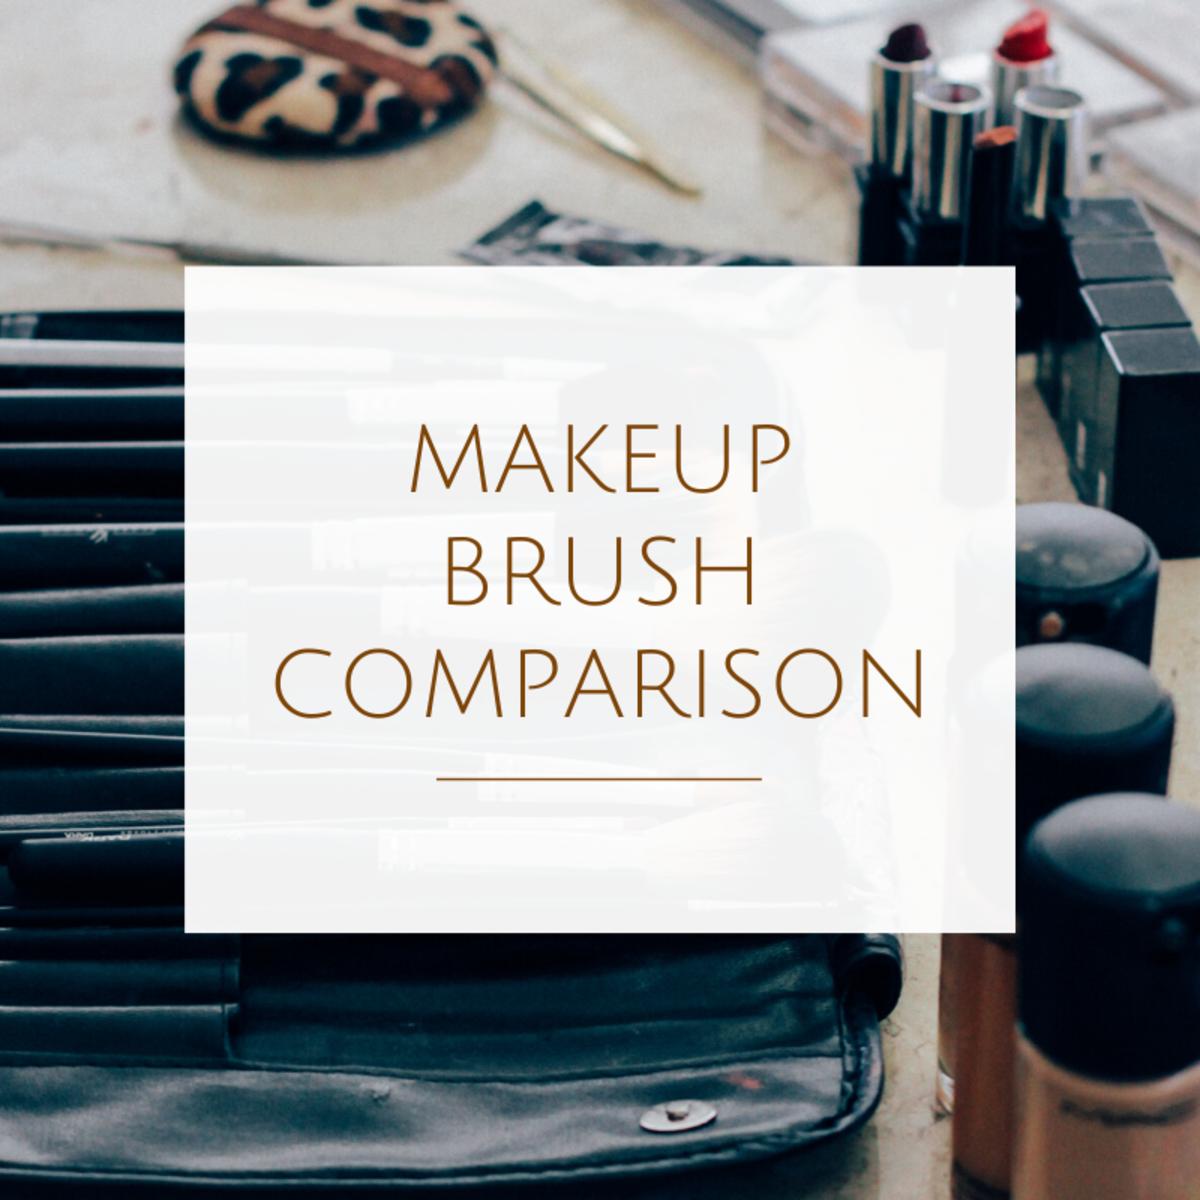 Sigma Essential Brushes vs. Bh Cosmetics Sculpt & Blend Brushes